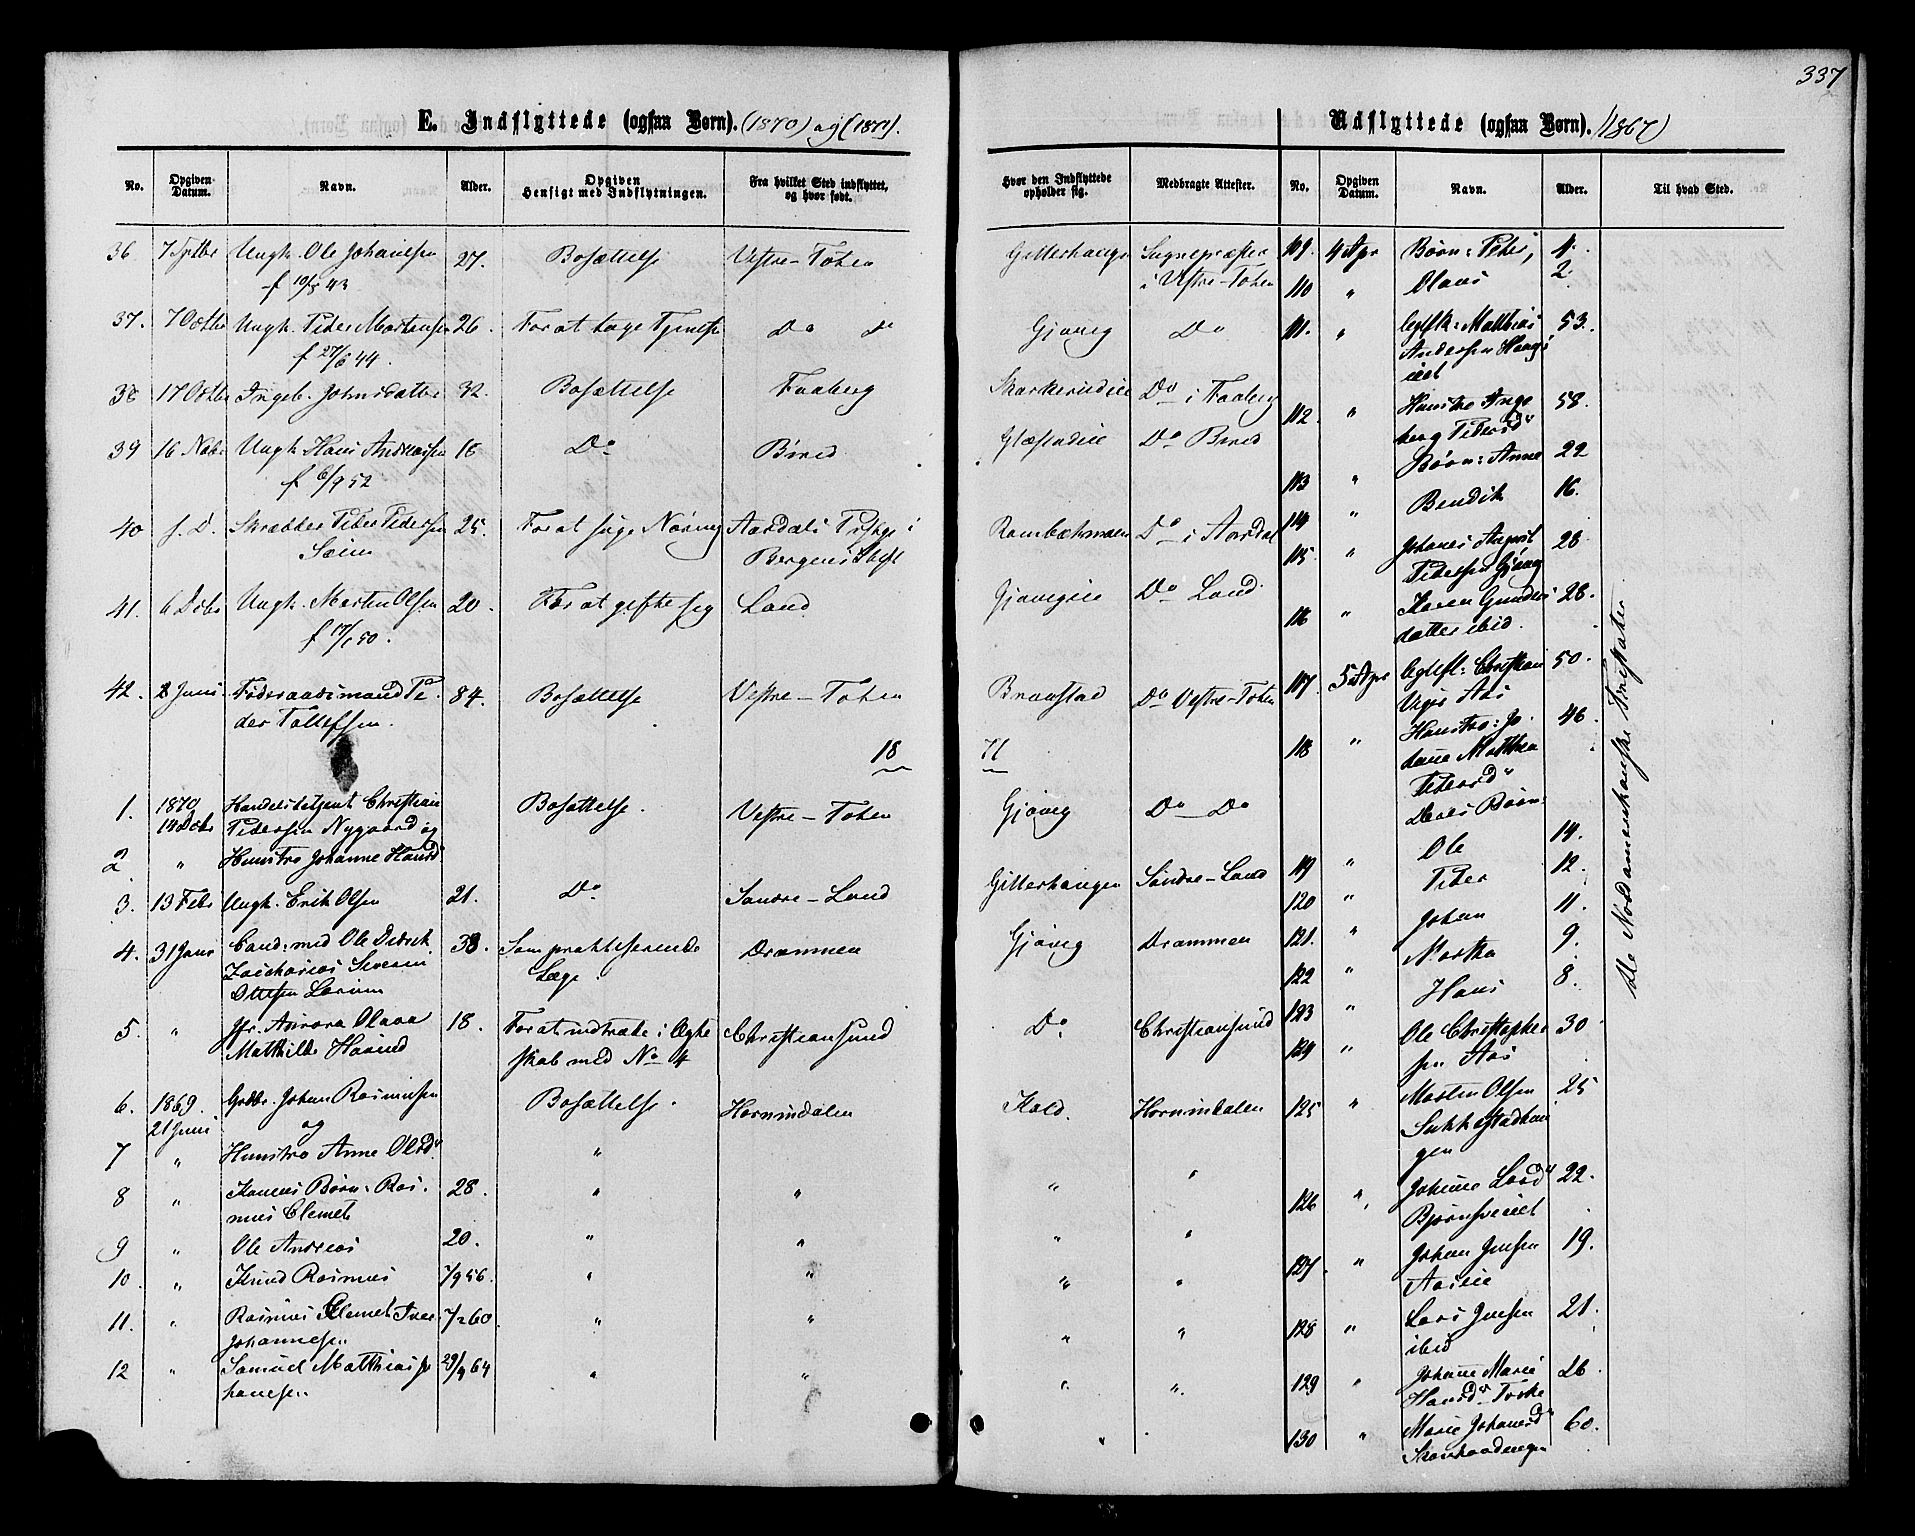 SAH, Vardal prestekontor, H/Ha/Haa/L0007: Ministerialbok nr. 7, 1867-1878, s. 337